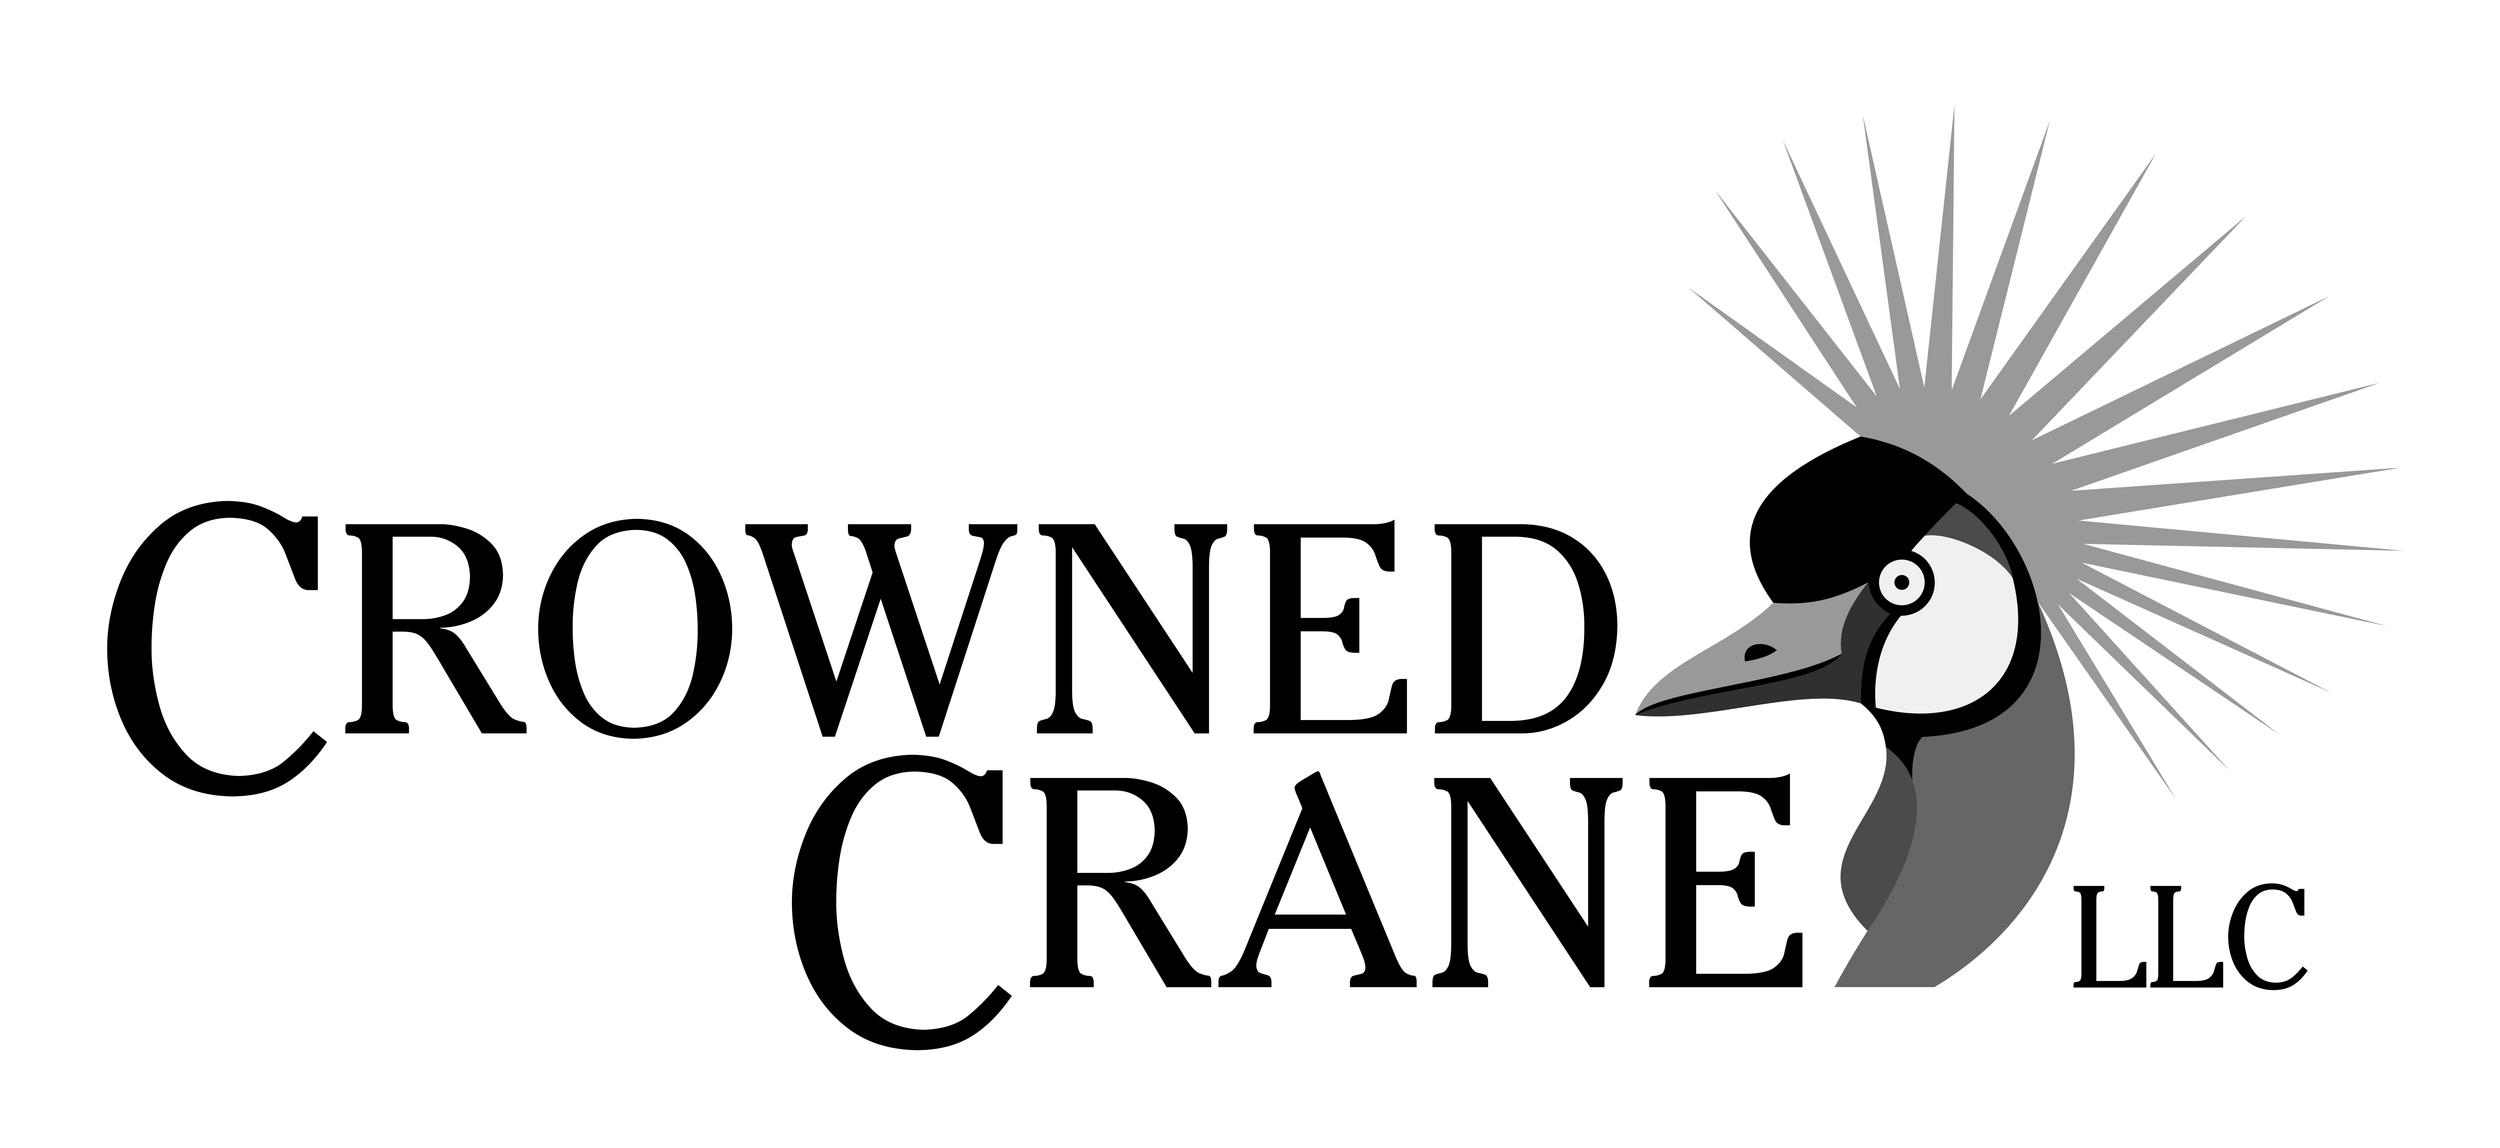 Crowned Crane logo.jpg